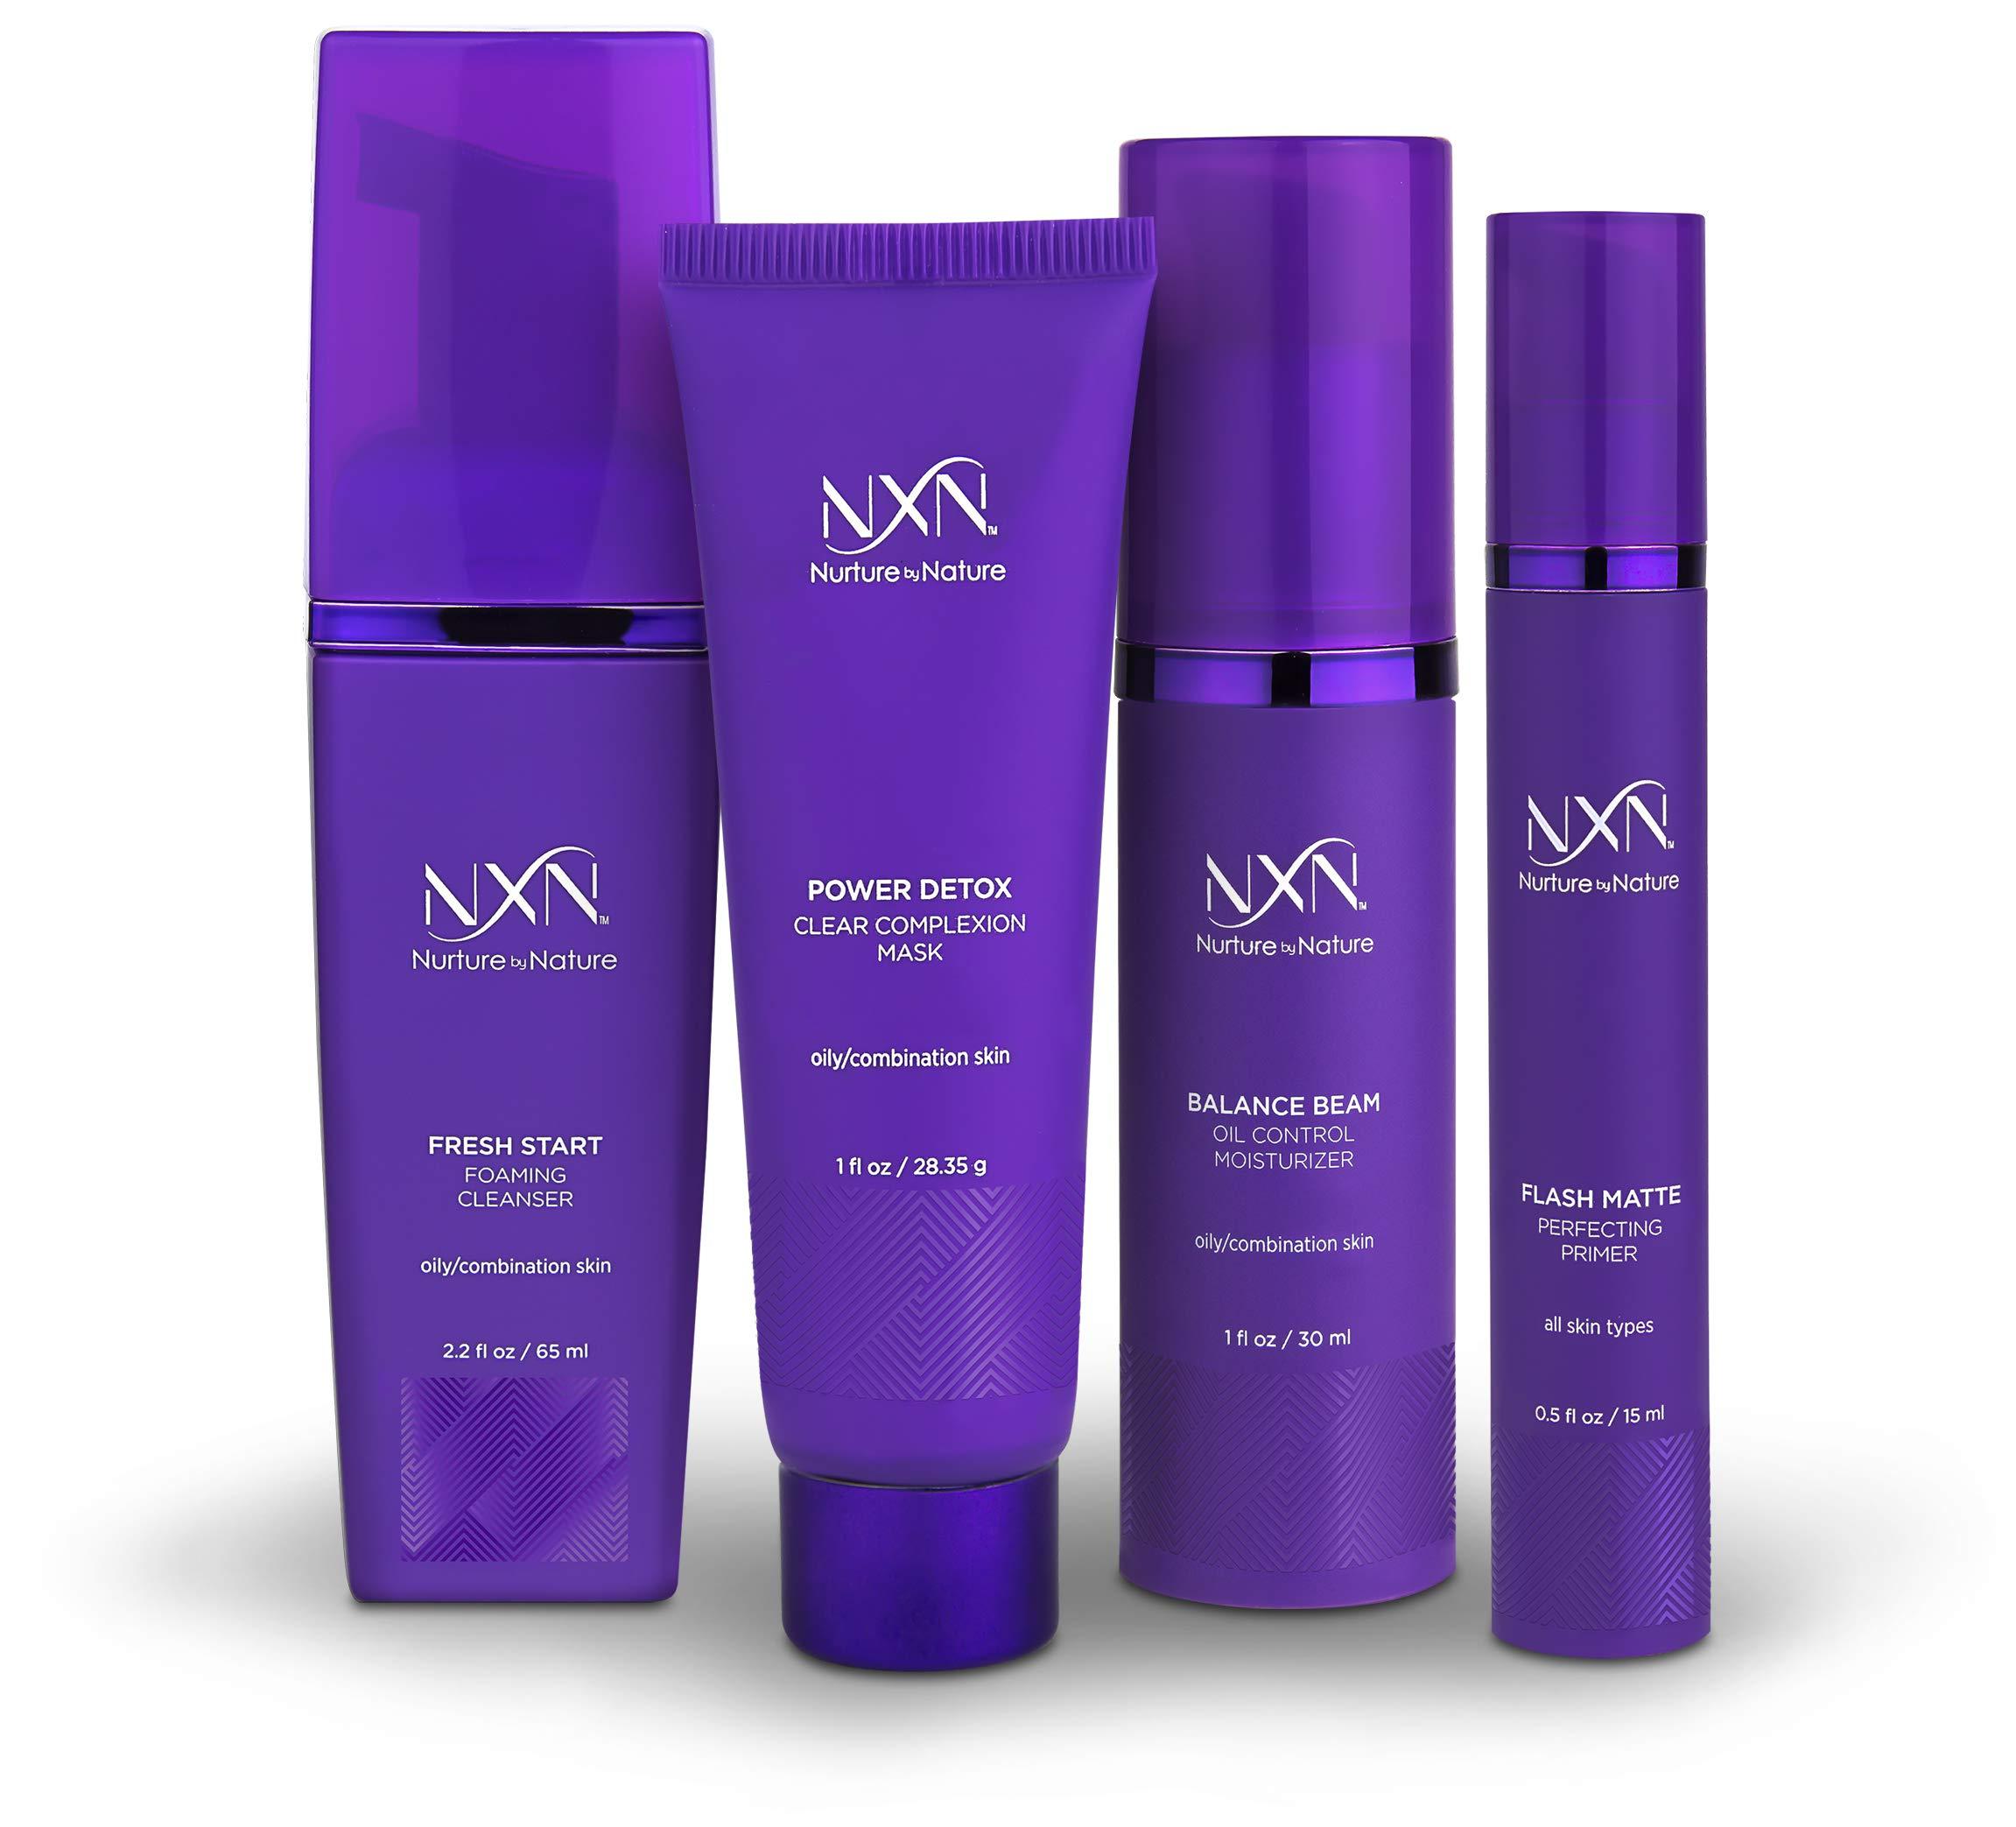 NxN Oil Control System